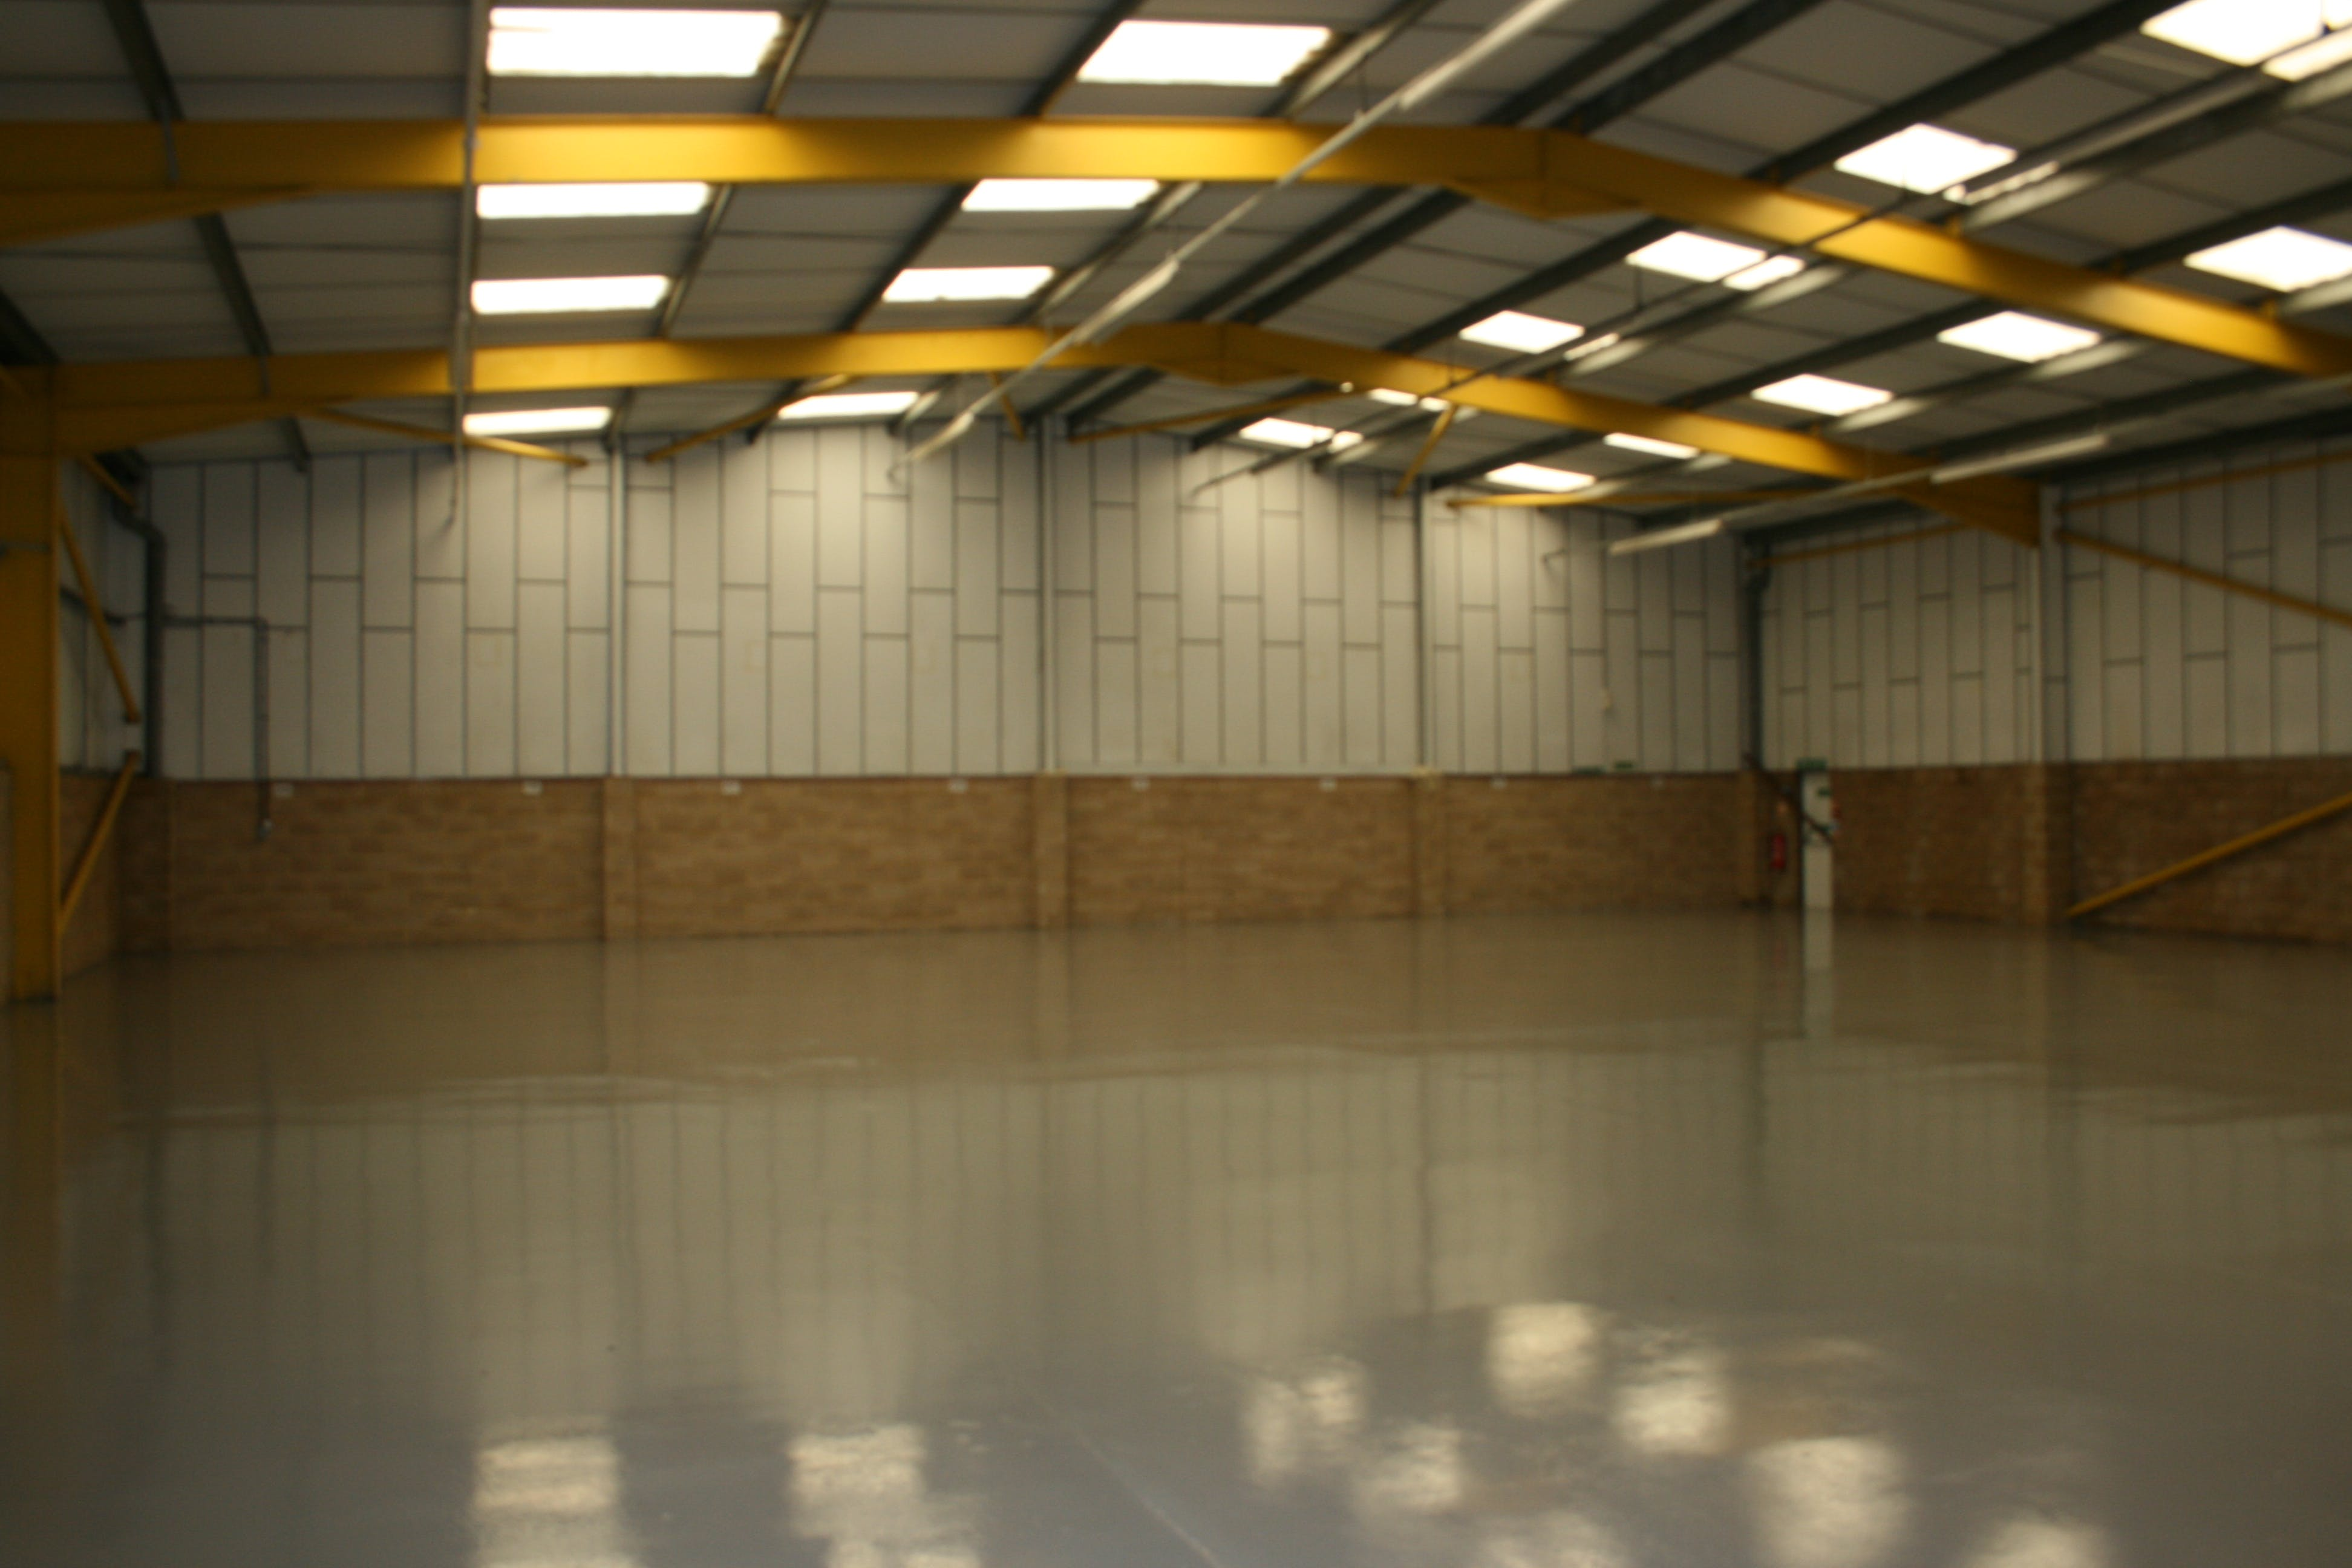 51 Woolmer Trading Estate, Bordon, Warehouse & Industrial To Let - IMG_0034.JPG